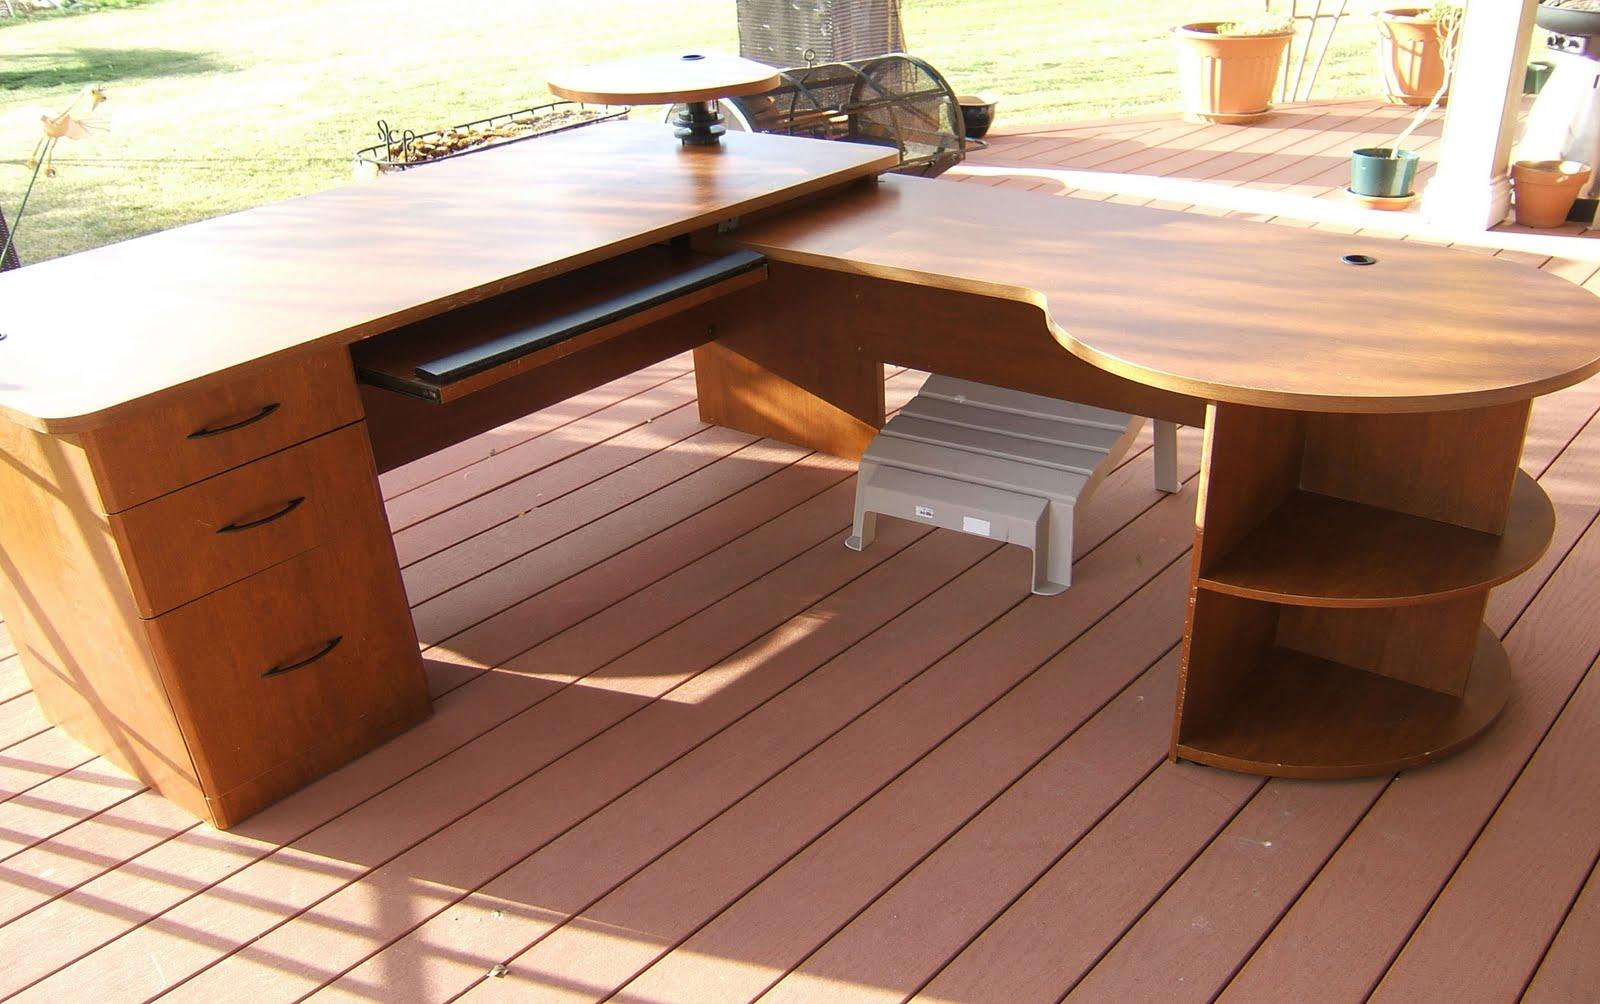 TOMMYS COLORADO GARAGE SALE Office Desk For Sale On